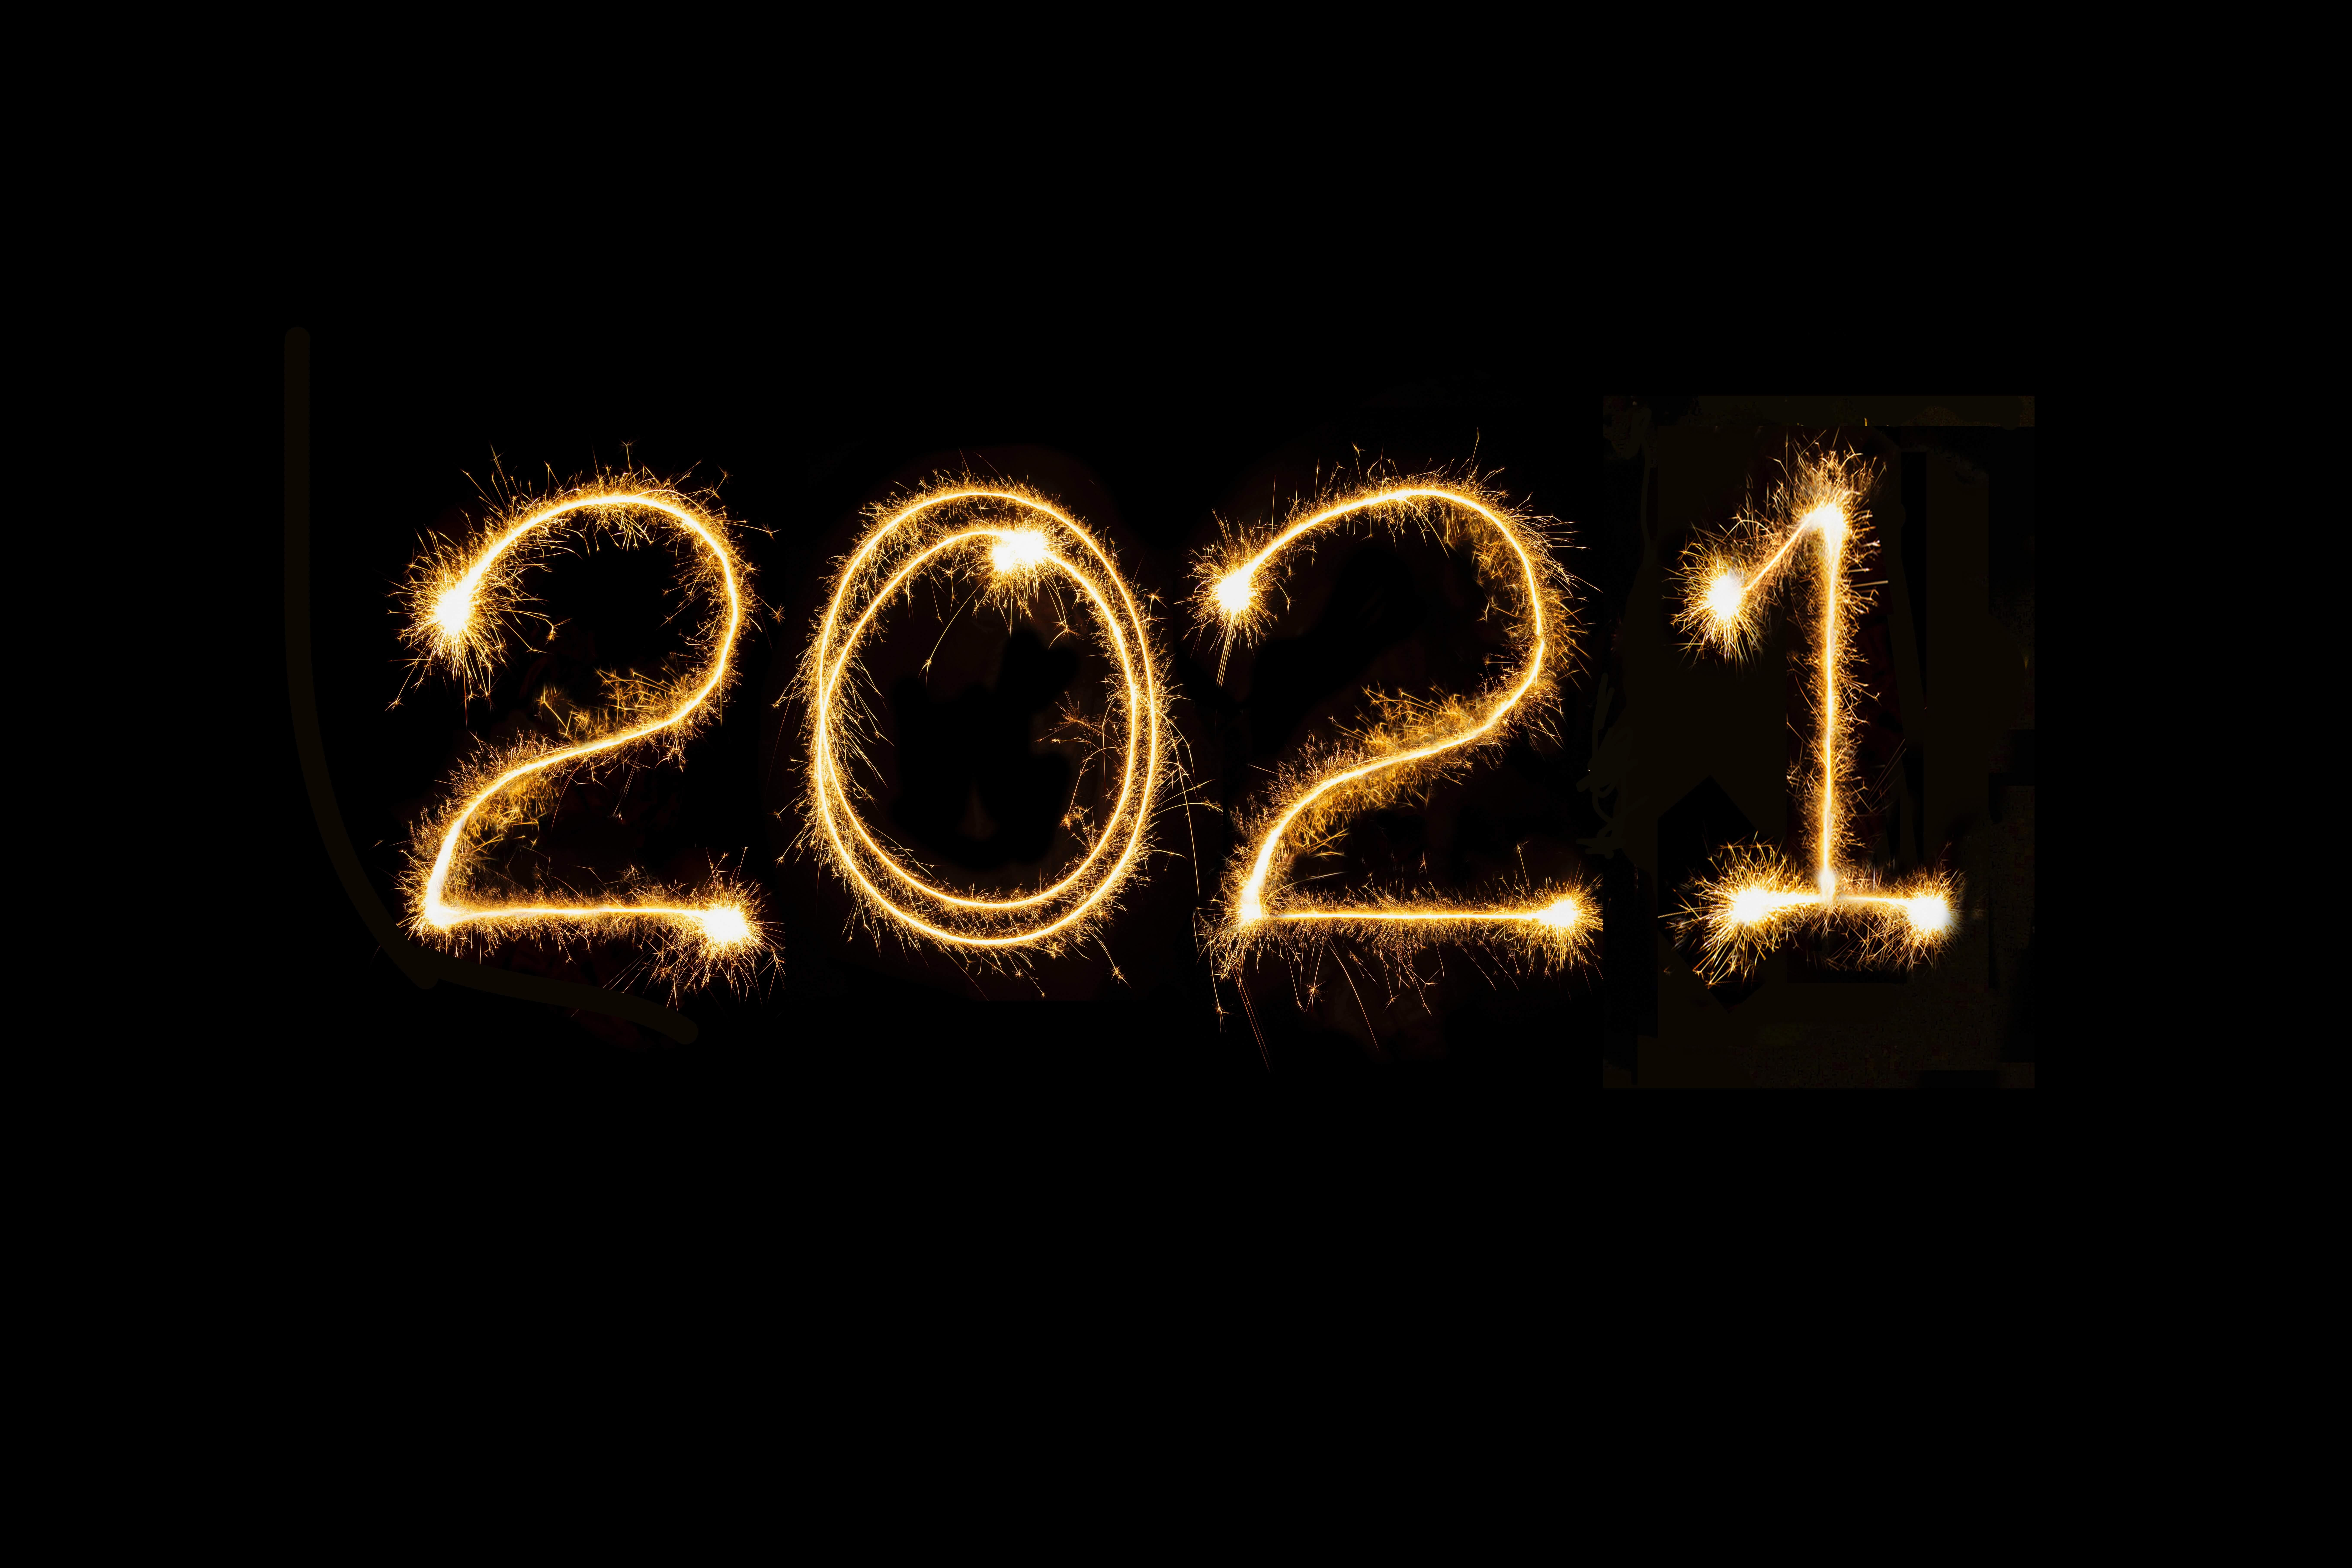 2021, ilustracija: Jude Beck/Unsplash